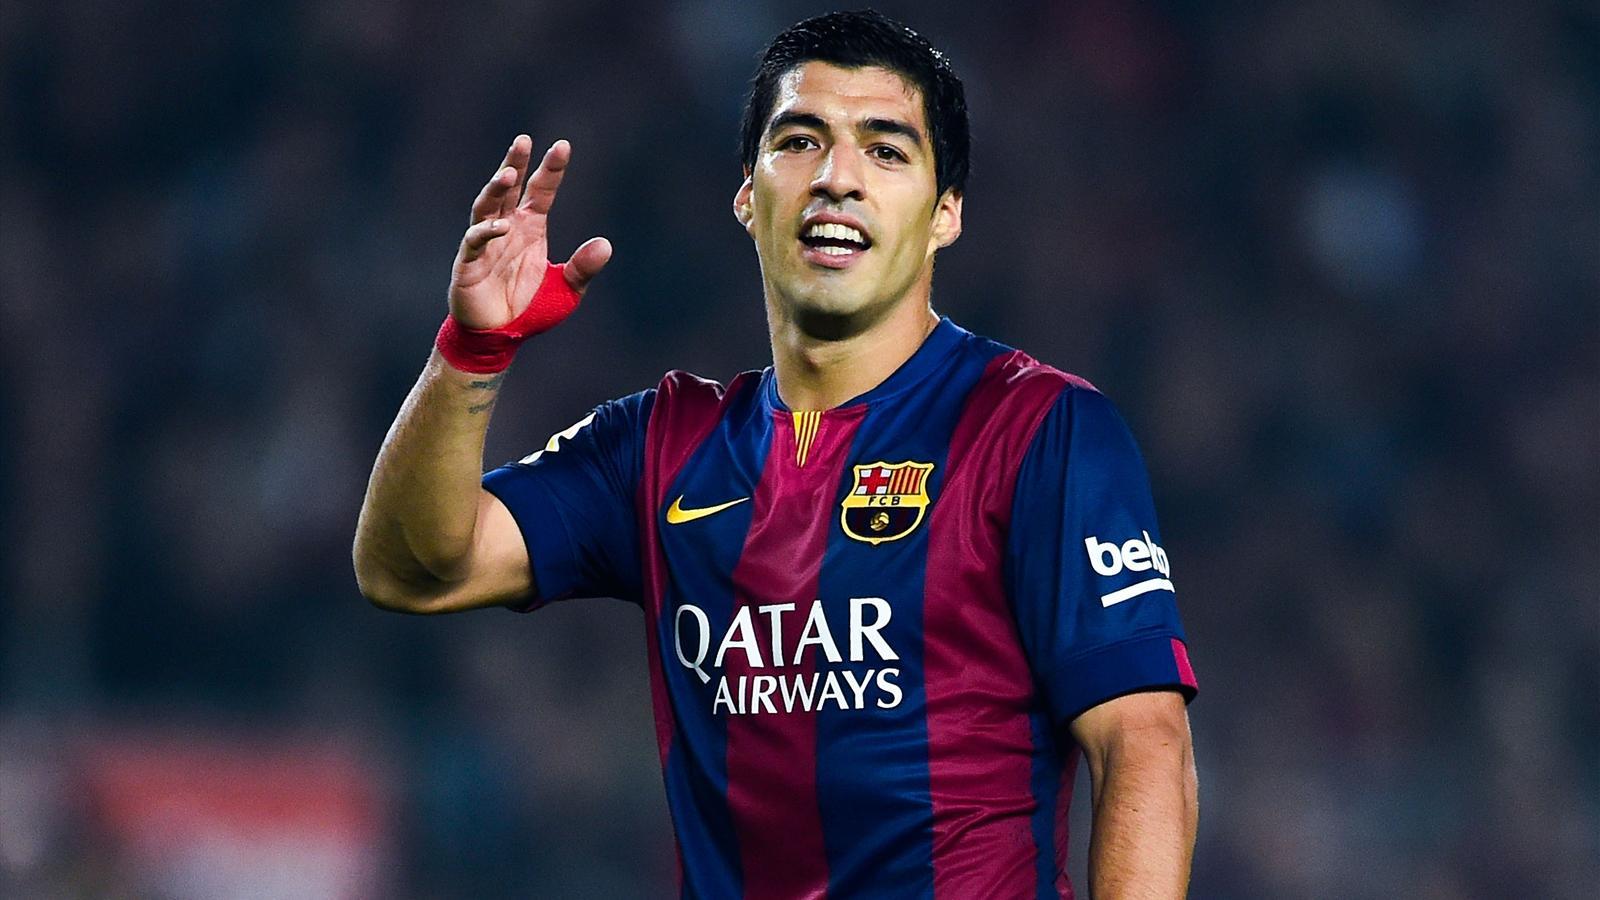 Суарес продолжит карьеру в Манчестер Сити?